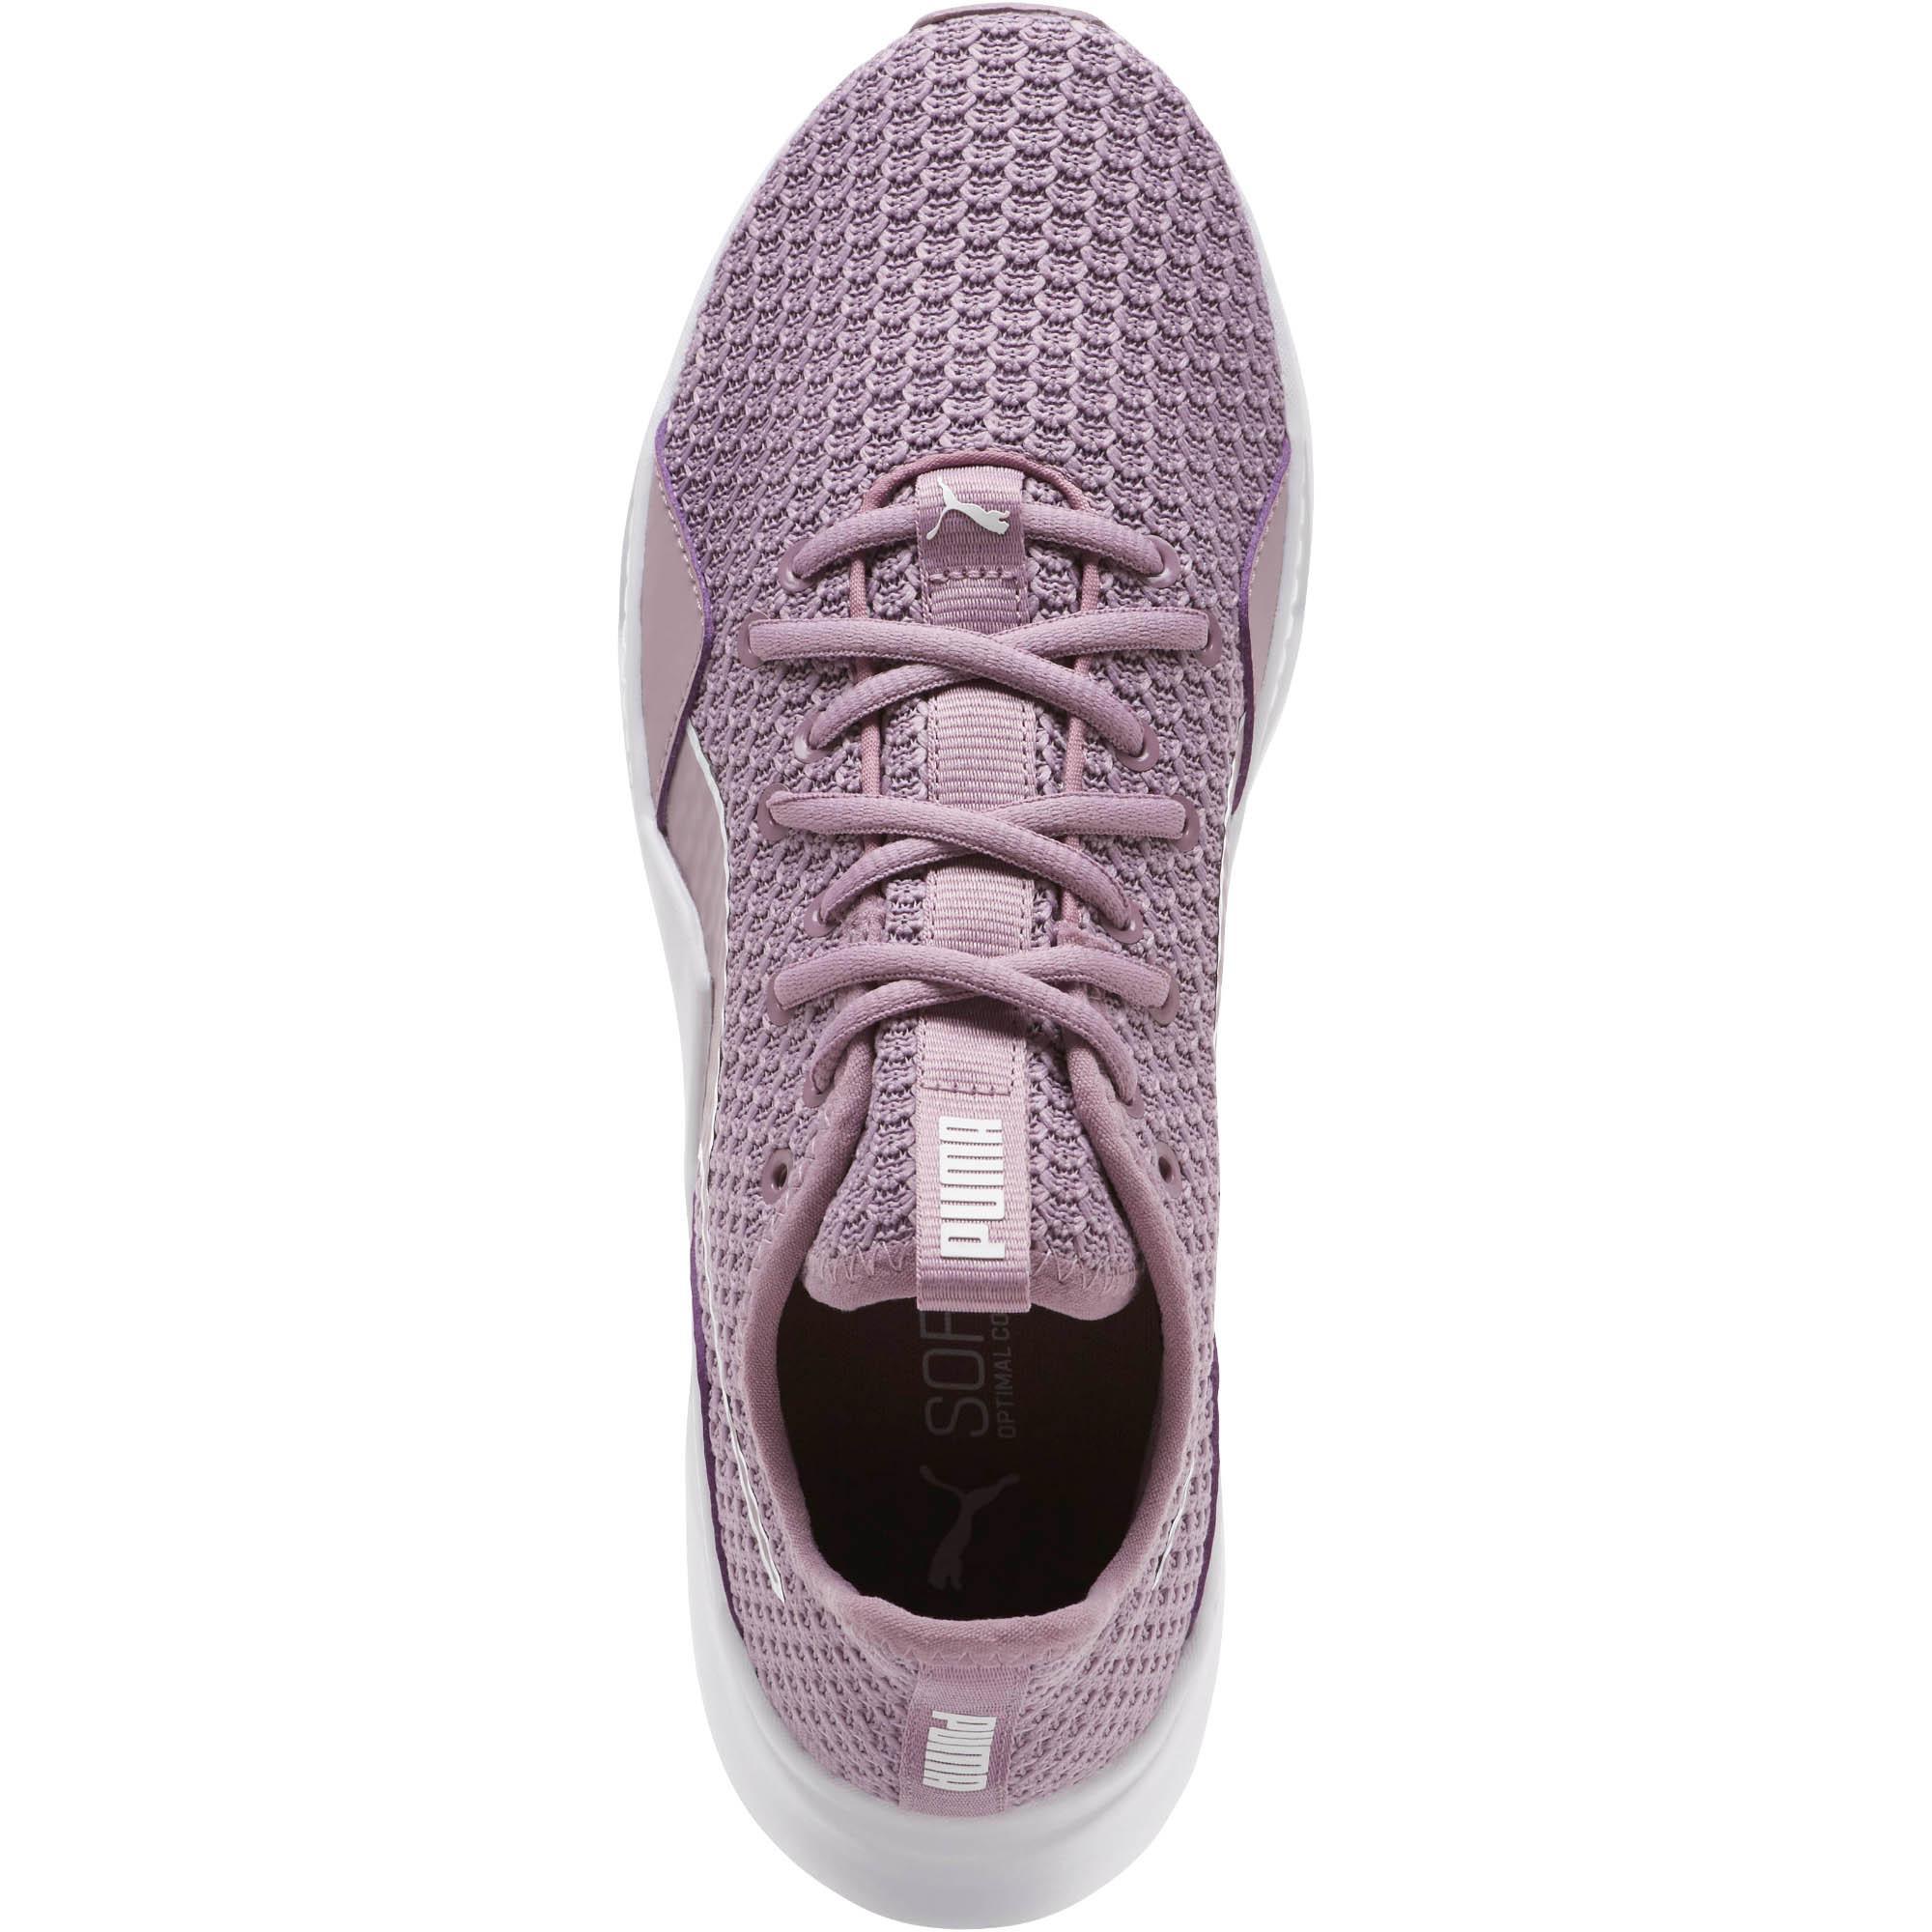 Puma Incite FS Wn's Fitness Shoes Damen elderberry puma white